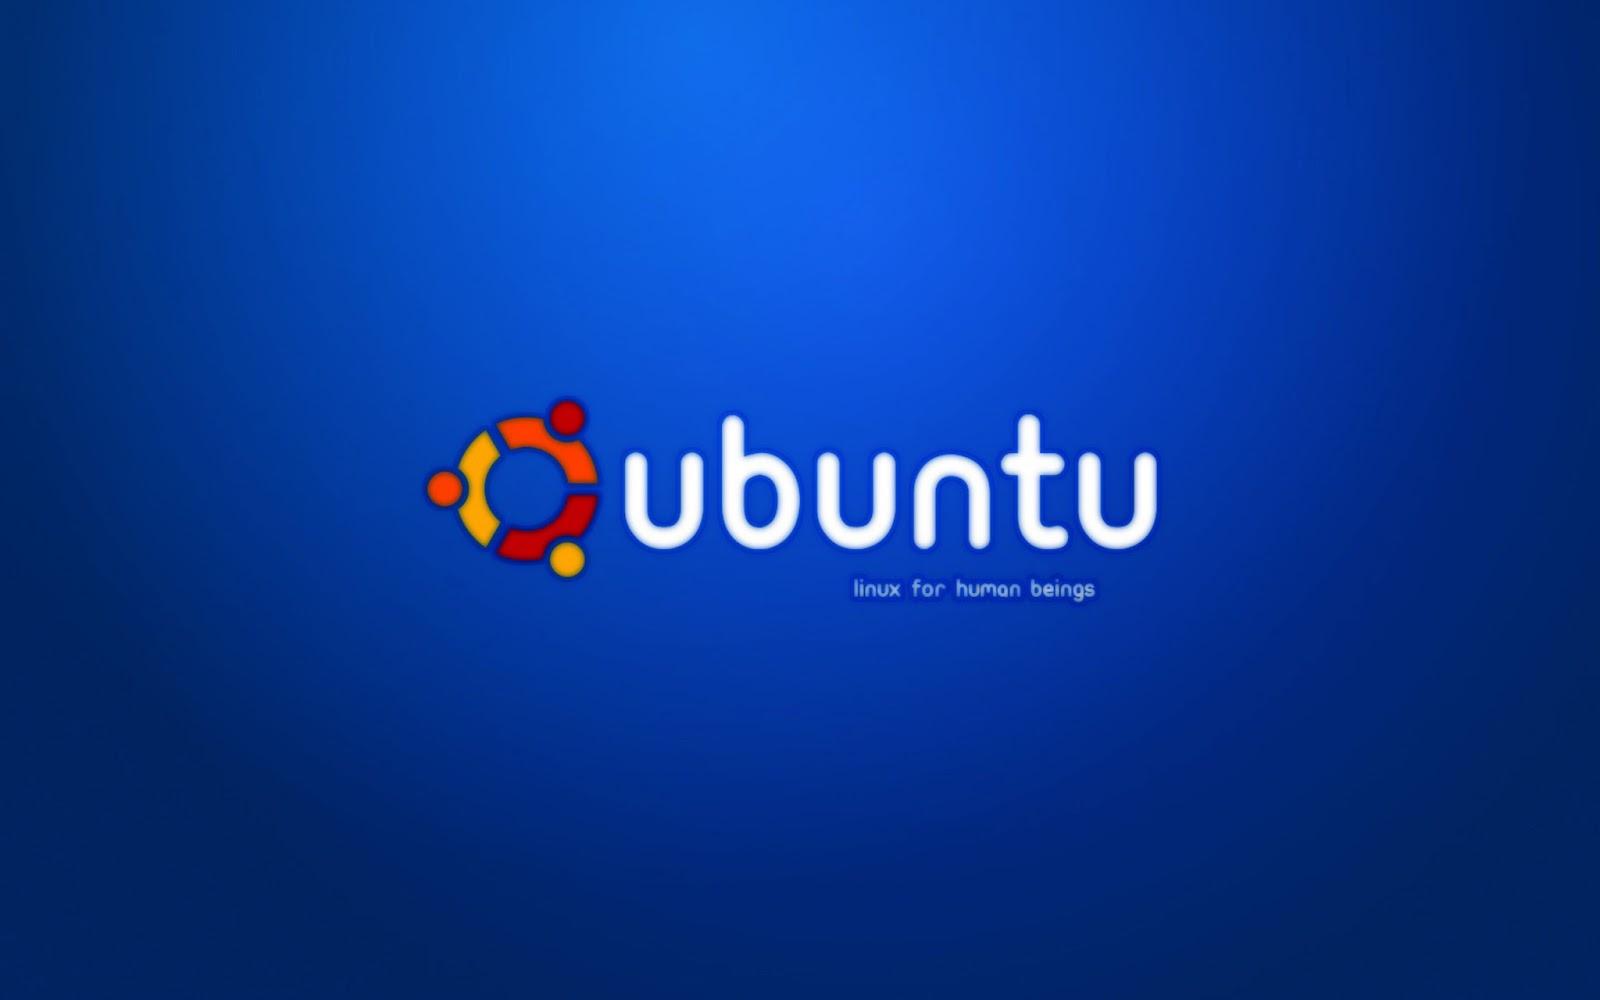 hd ubuntu wallpapers hd ubuntu wallpapers hd ubuntu wallpapers hd 1600x1000